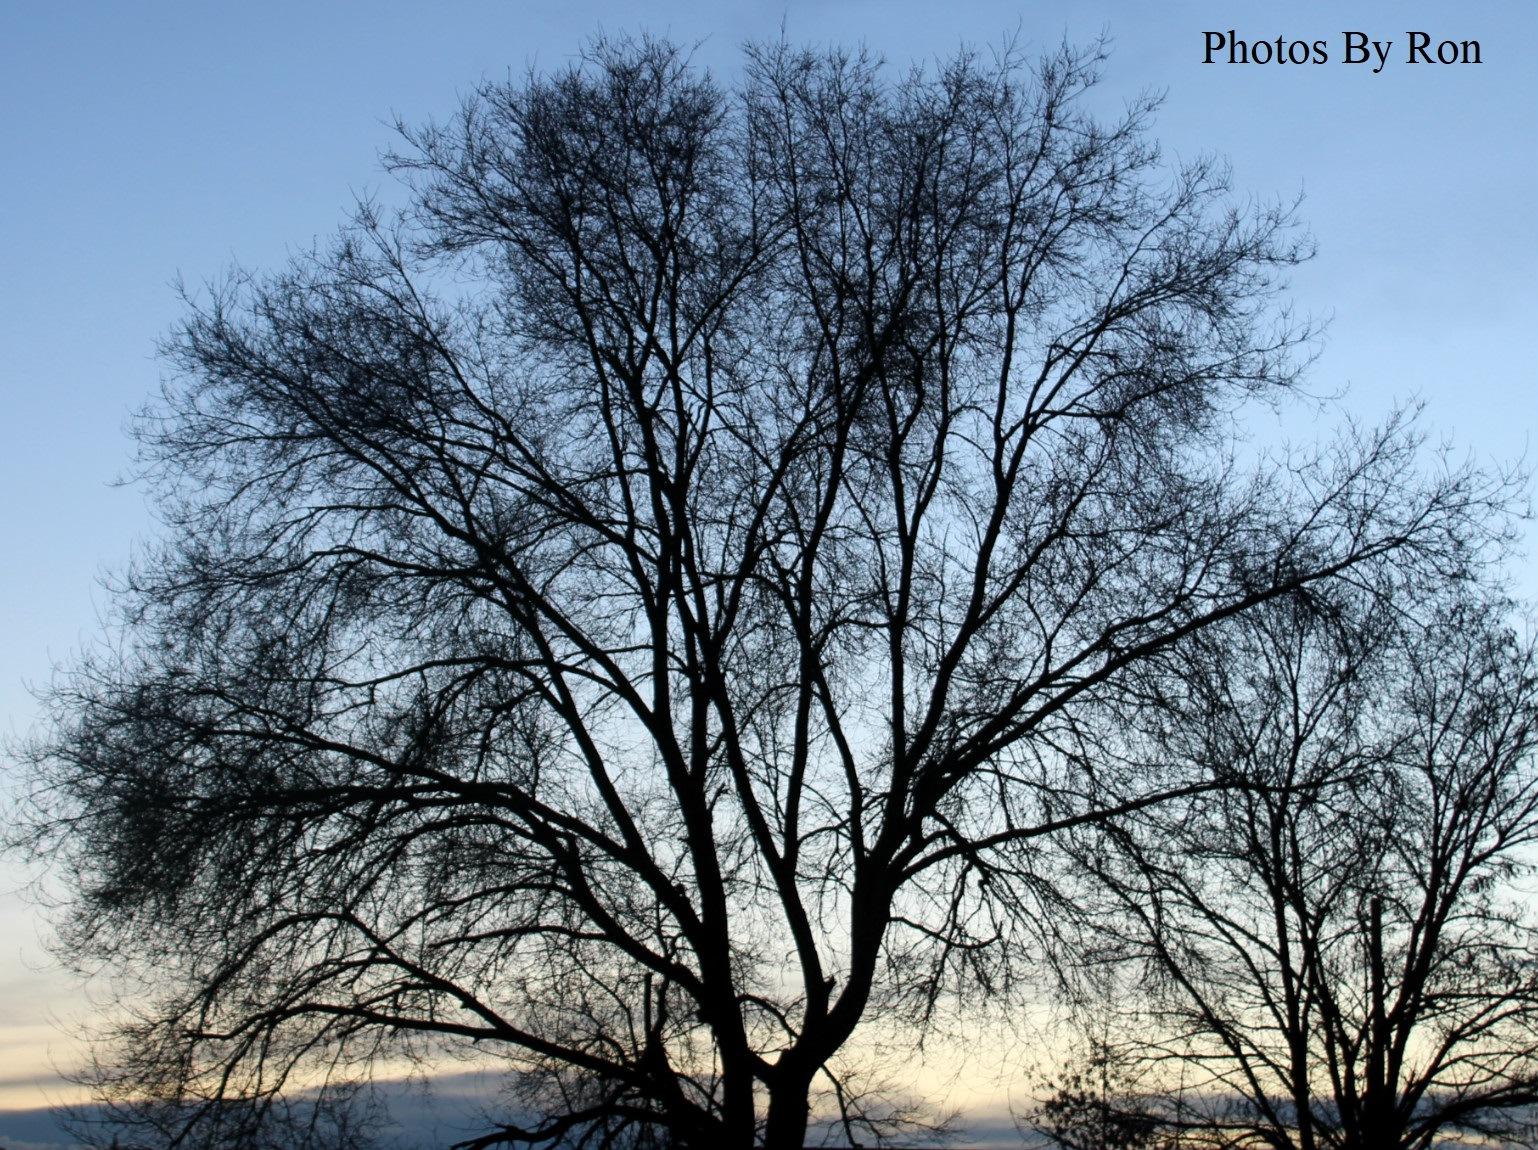 """A Neighbors Trees At Dusk"" by Ron Berkley"